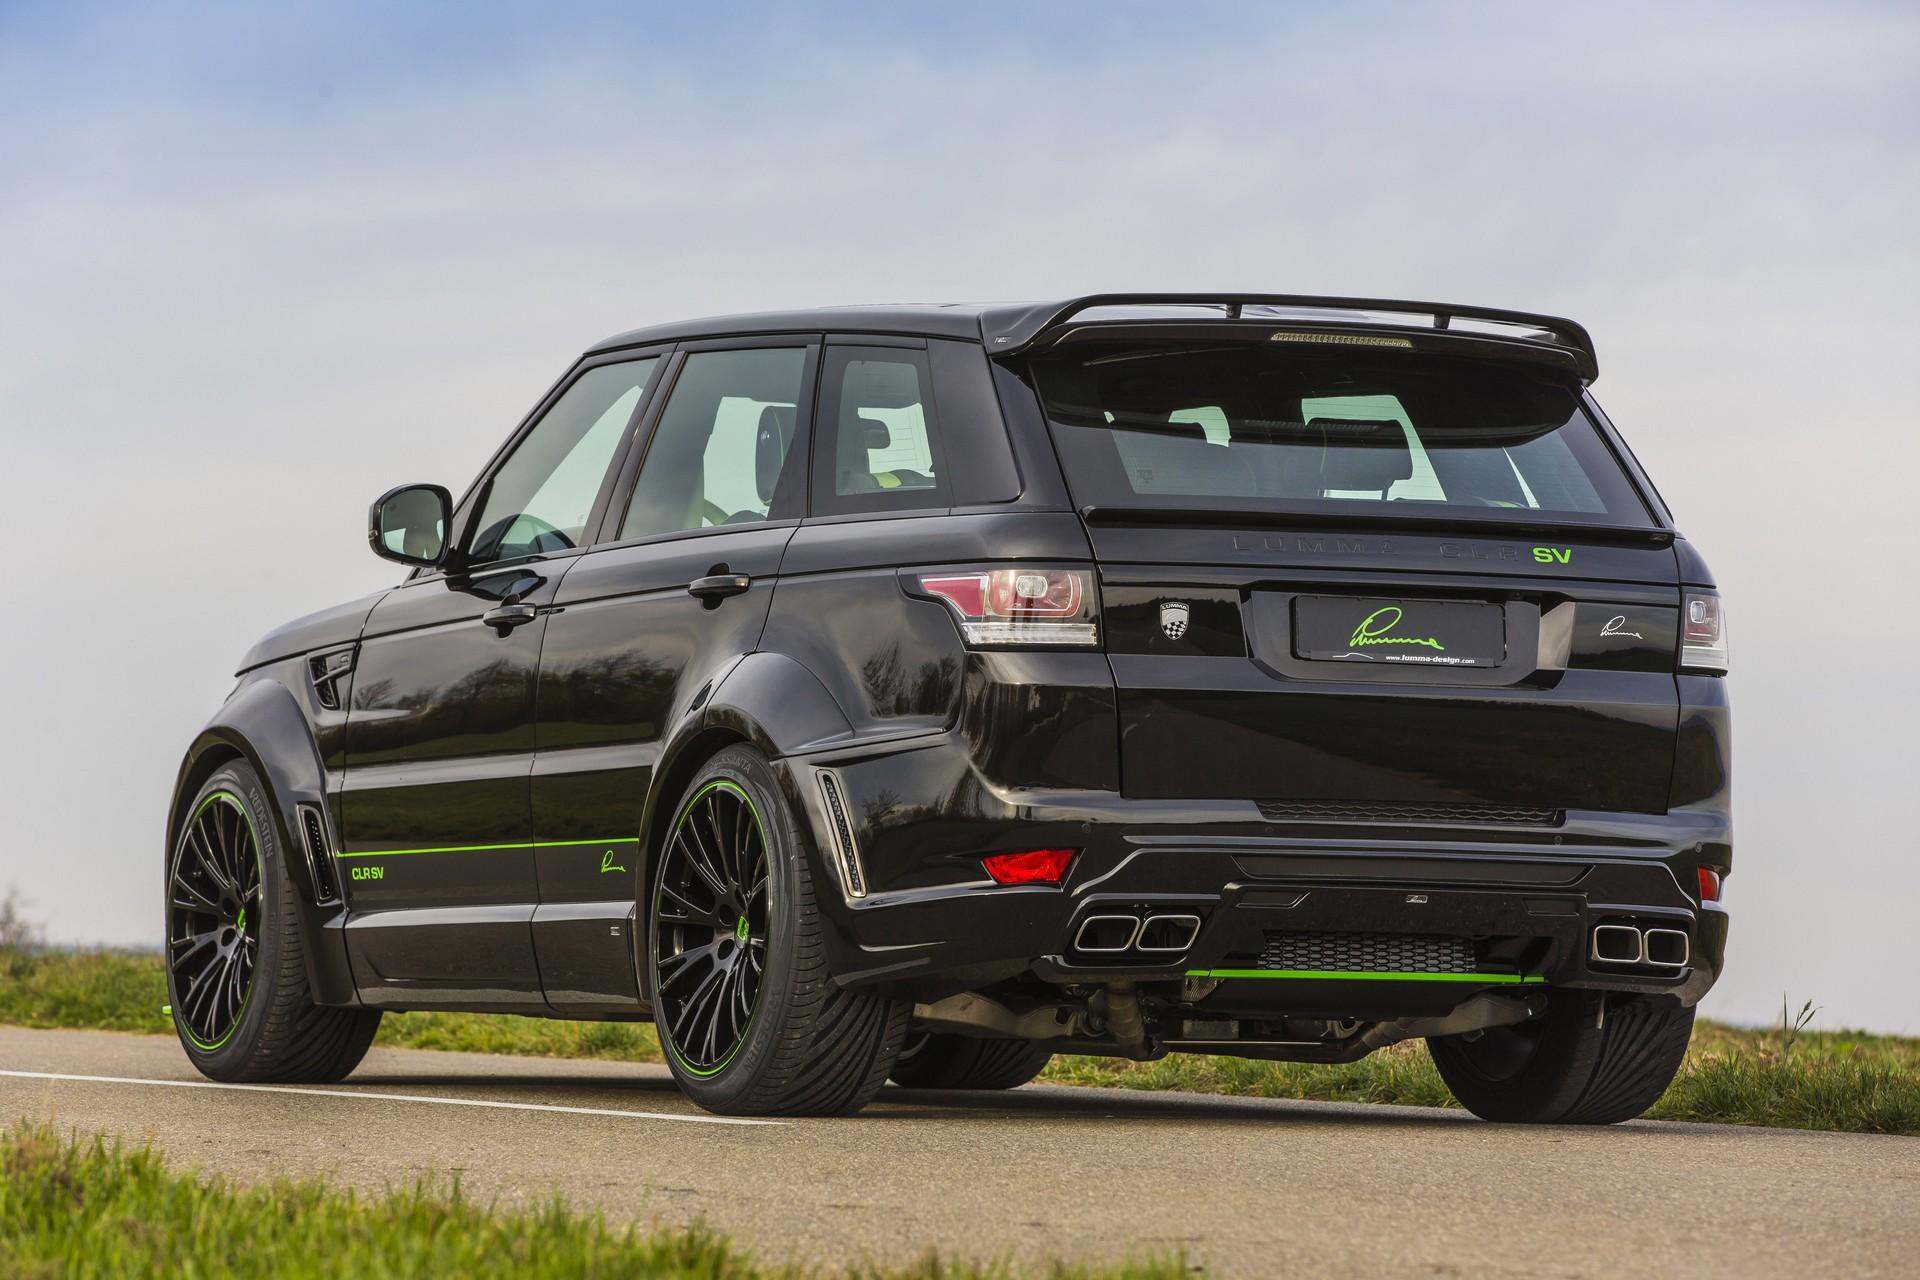 LUMMA CLR SV body styling kit for the Range Rover Sport / TopCar